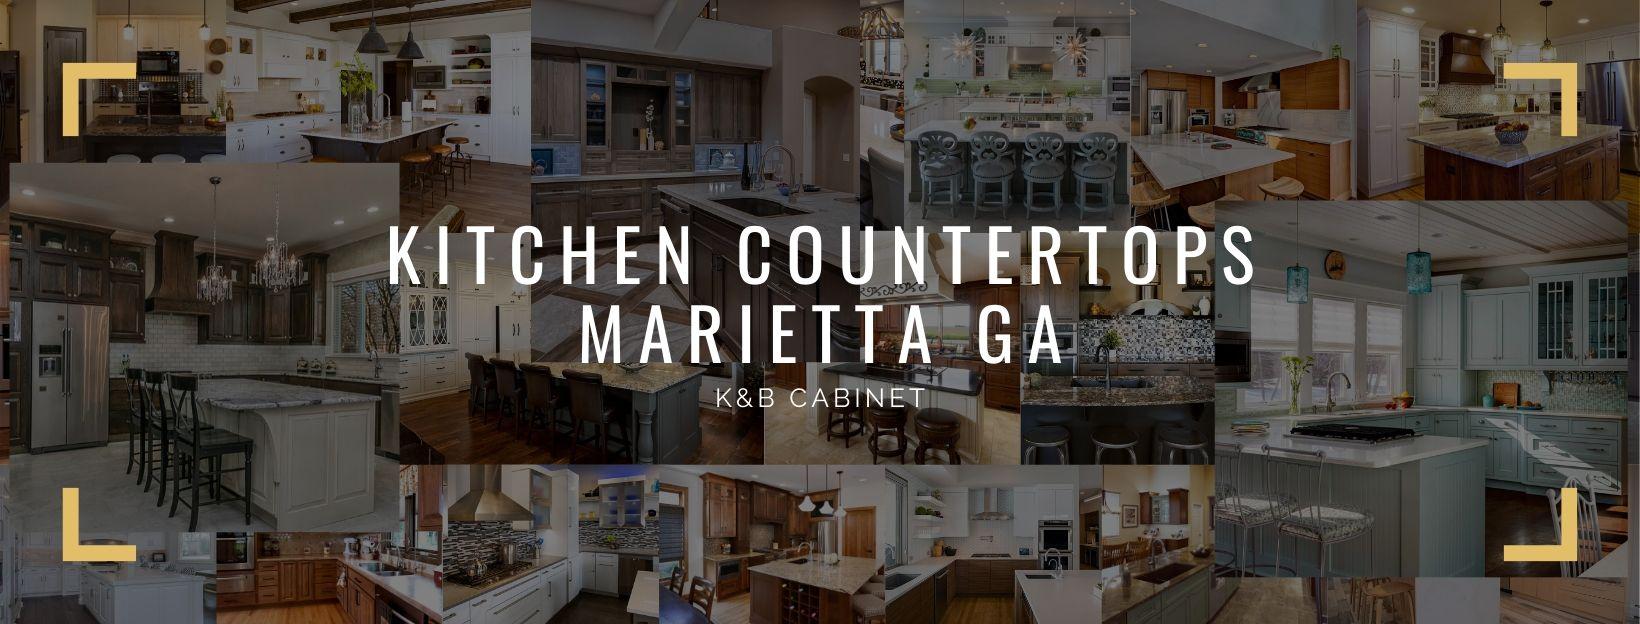 Kitchen Countertops Marietta GA